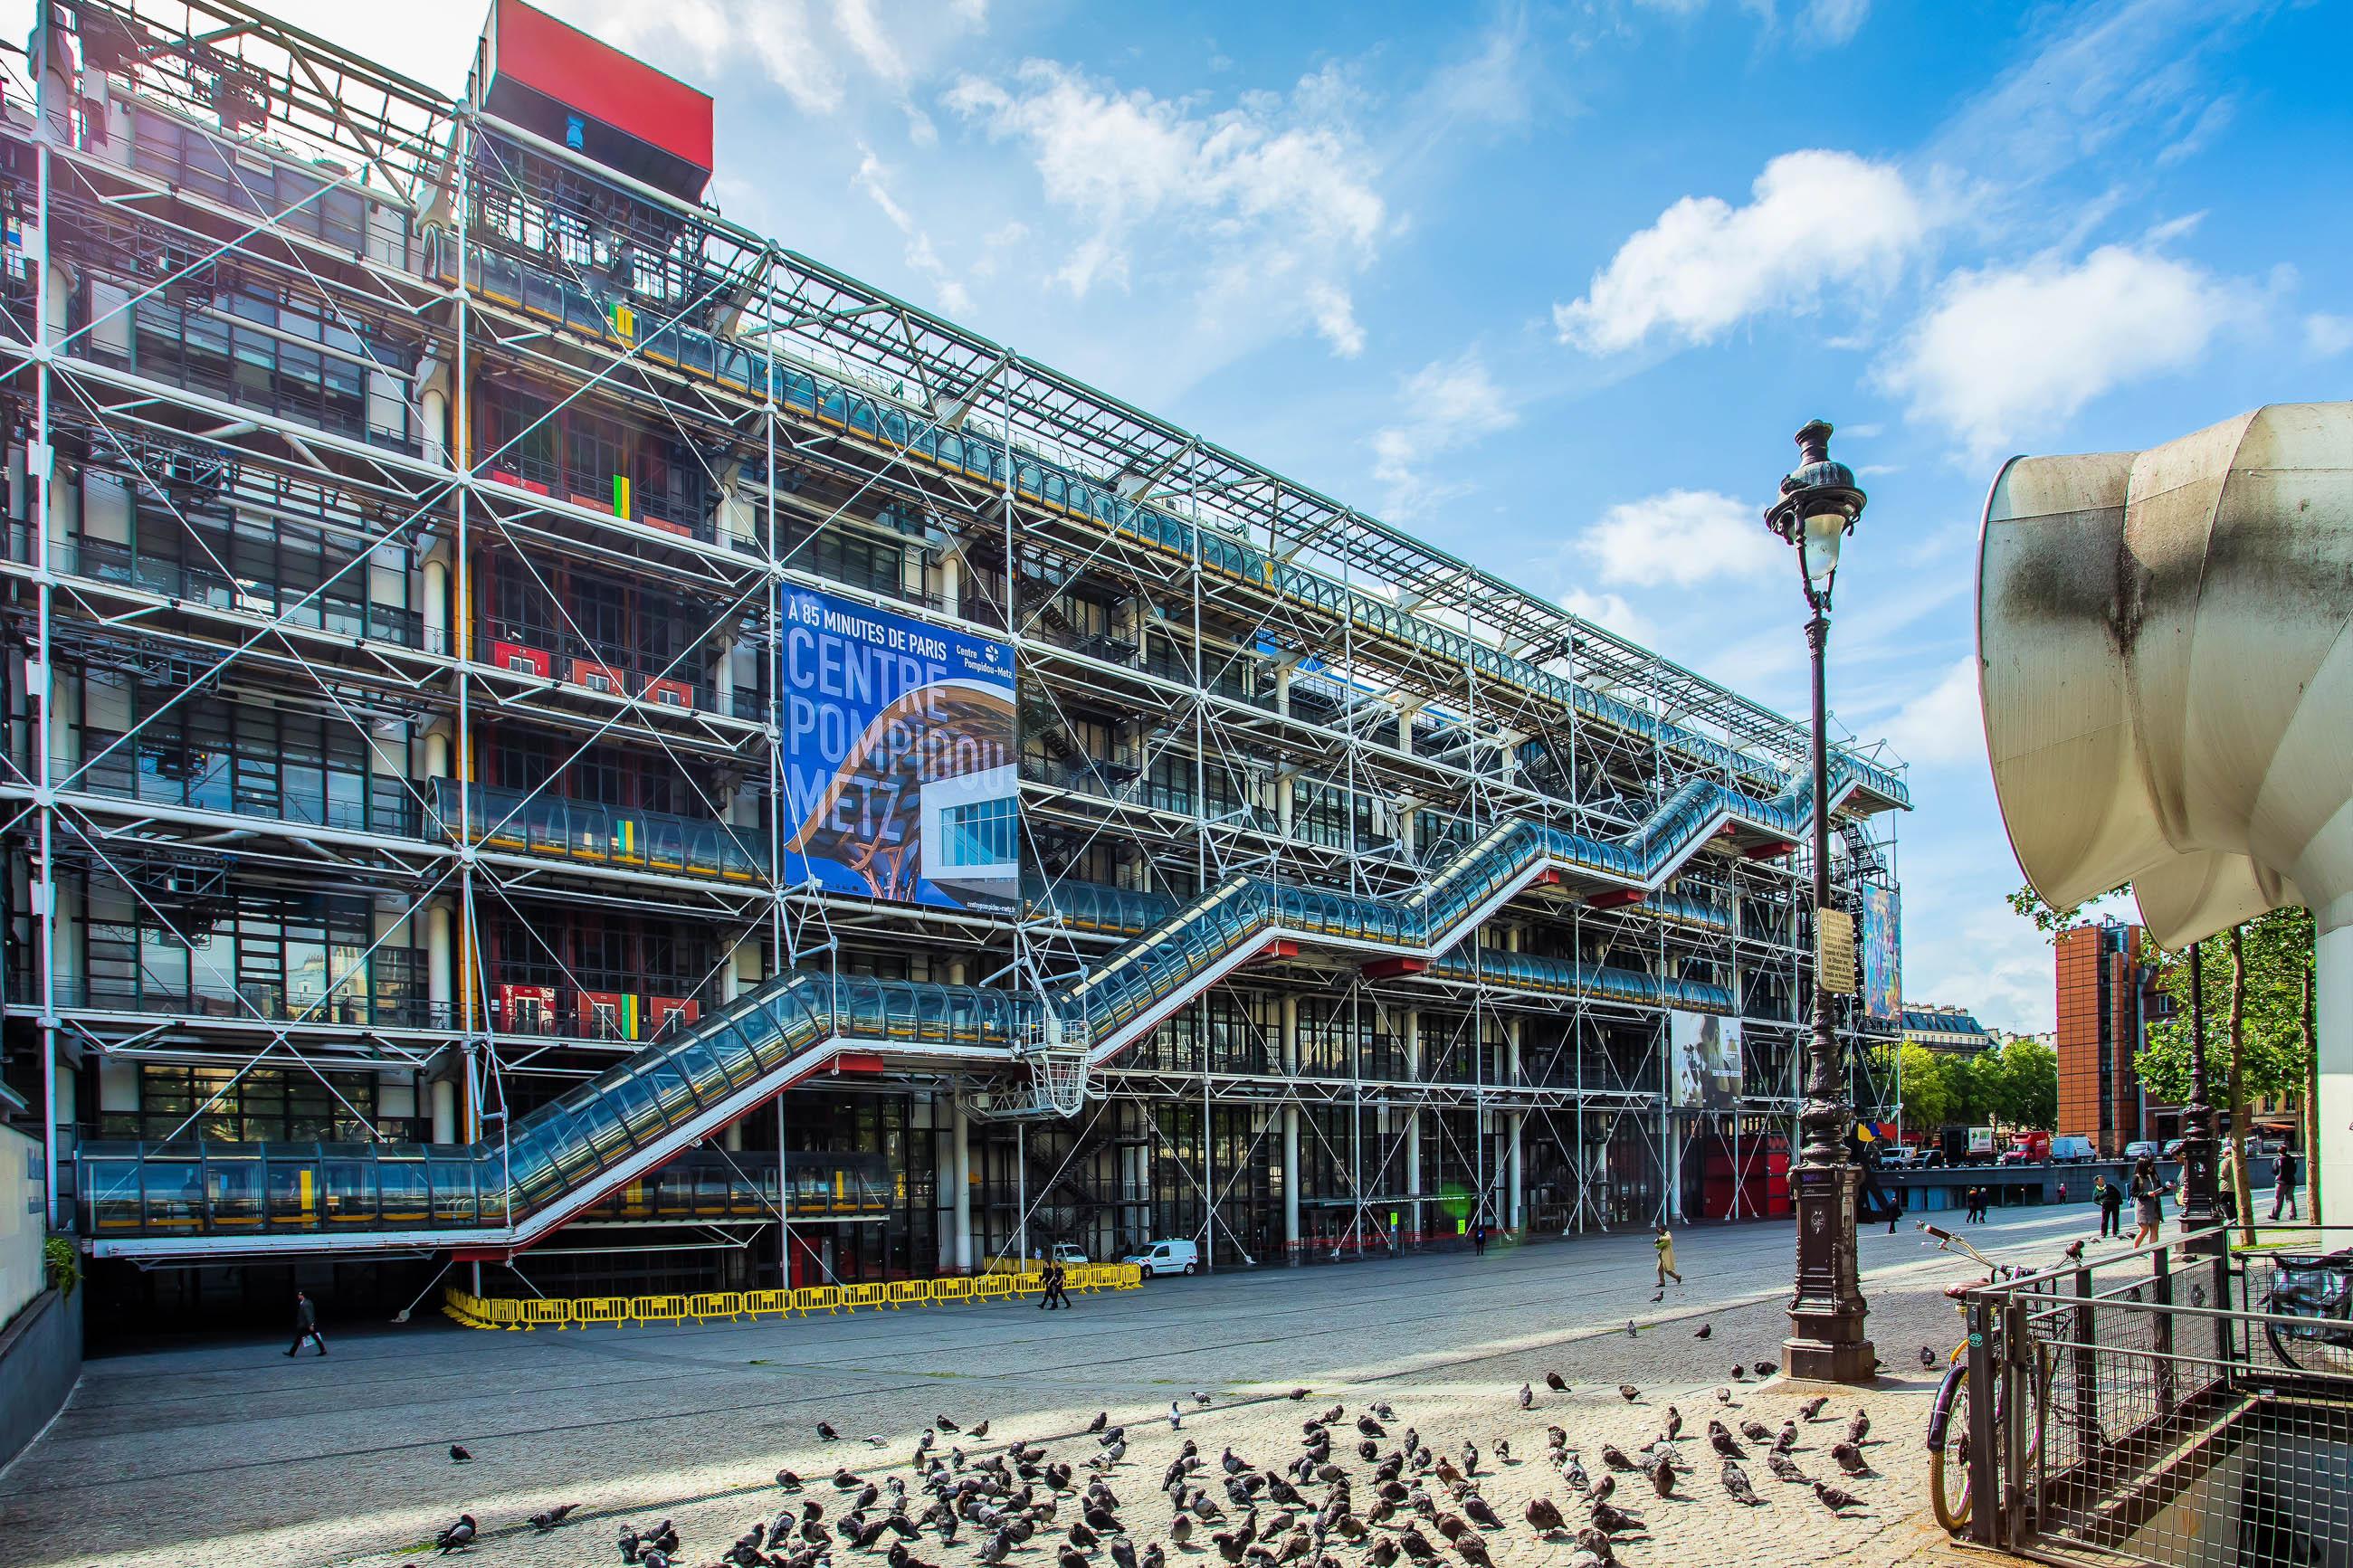 bilder centre pompidou in paris frankreich franks On centre pompidou prossimi eventi